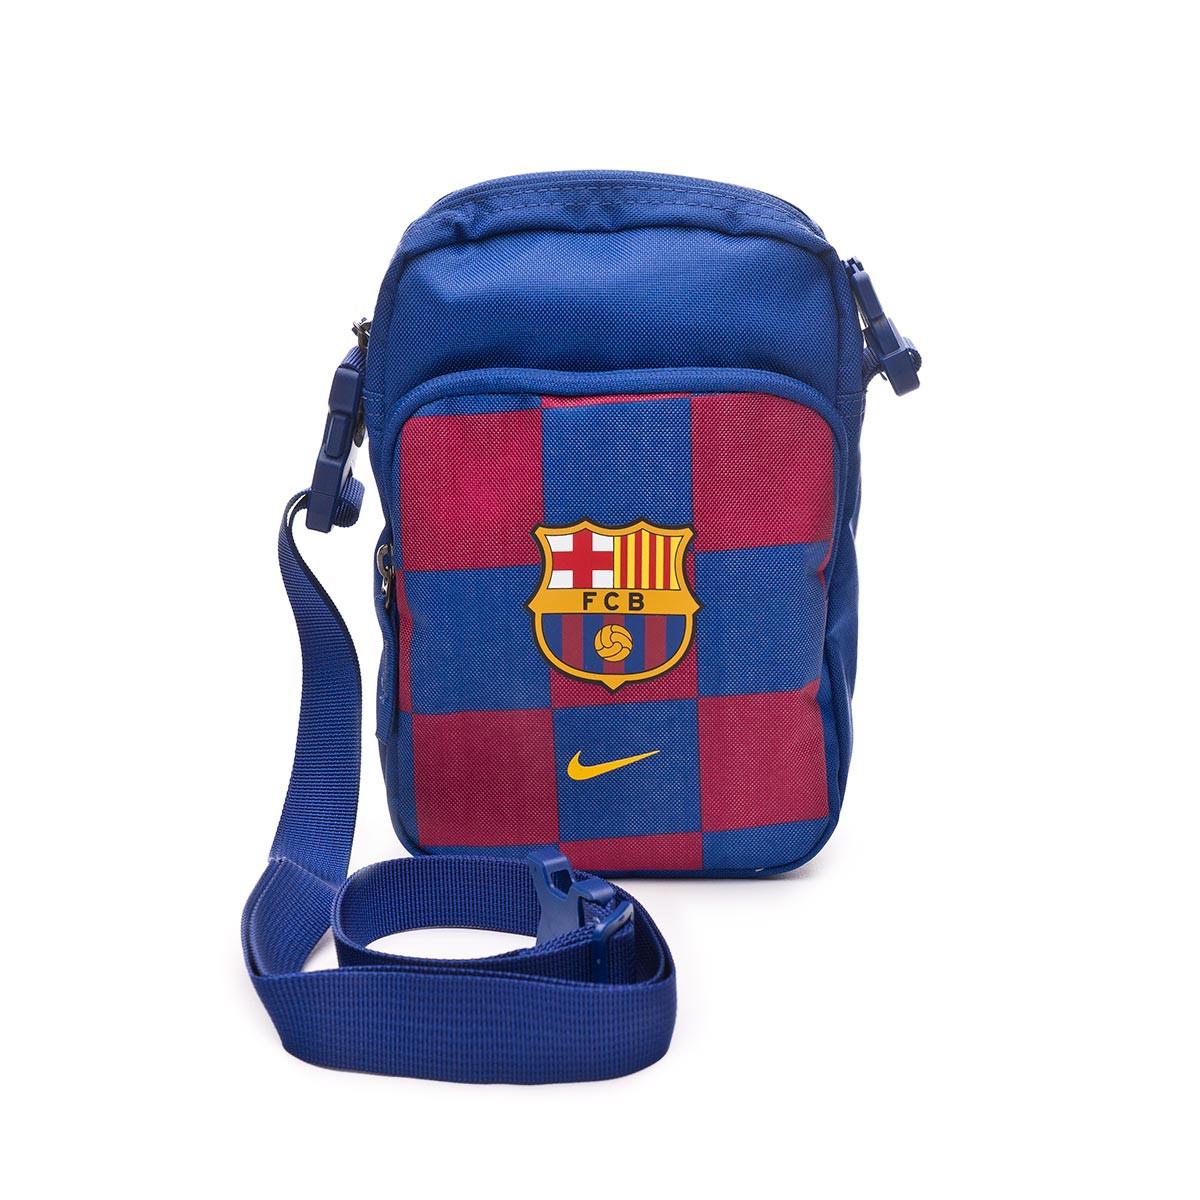 930b84bdea09 Bolsa Stadium FC Barcelona Smit 2019-2020 Deep royal blue-Noble red-Varsity  maize